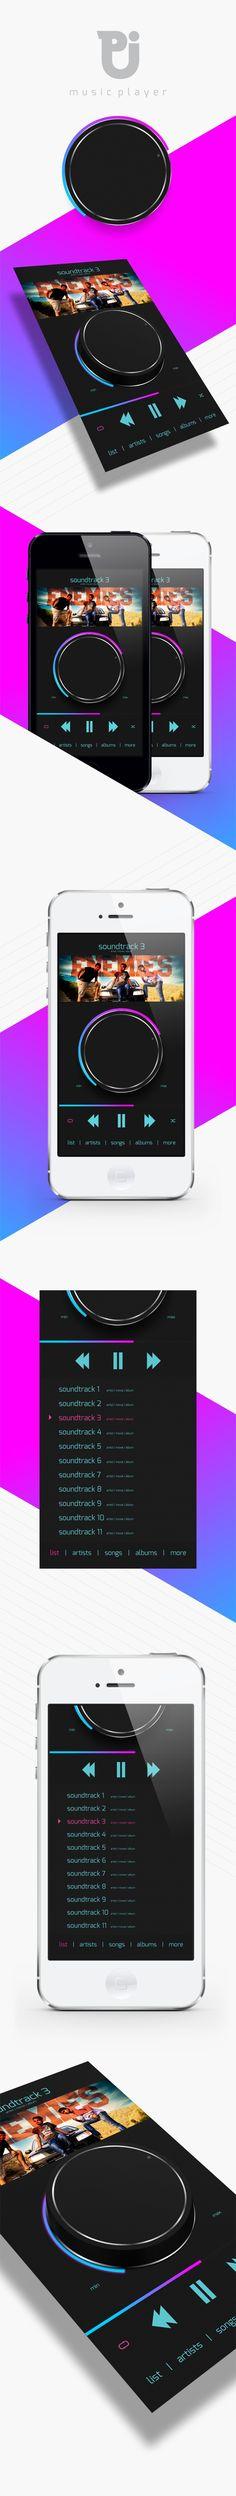 CONCEPT - iOS MUSIC PLAYER by Pintu Dhiman, via Behance